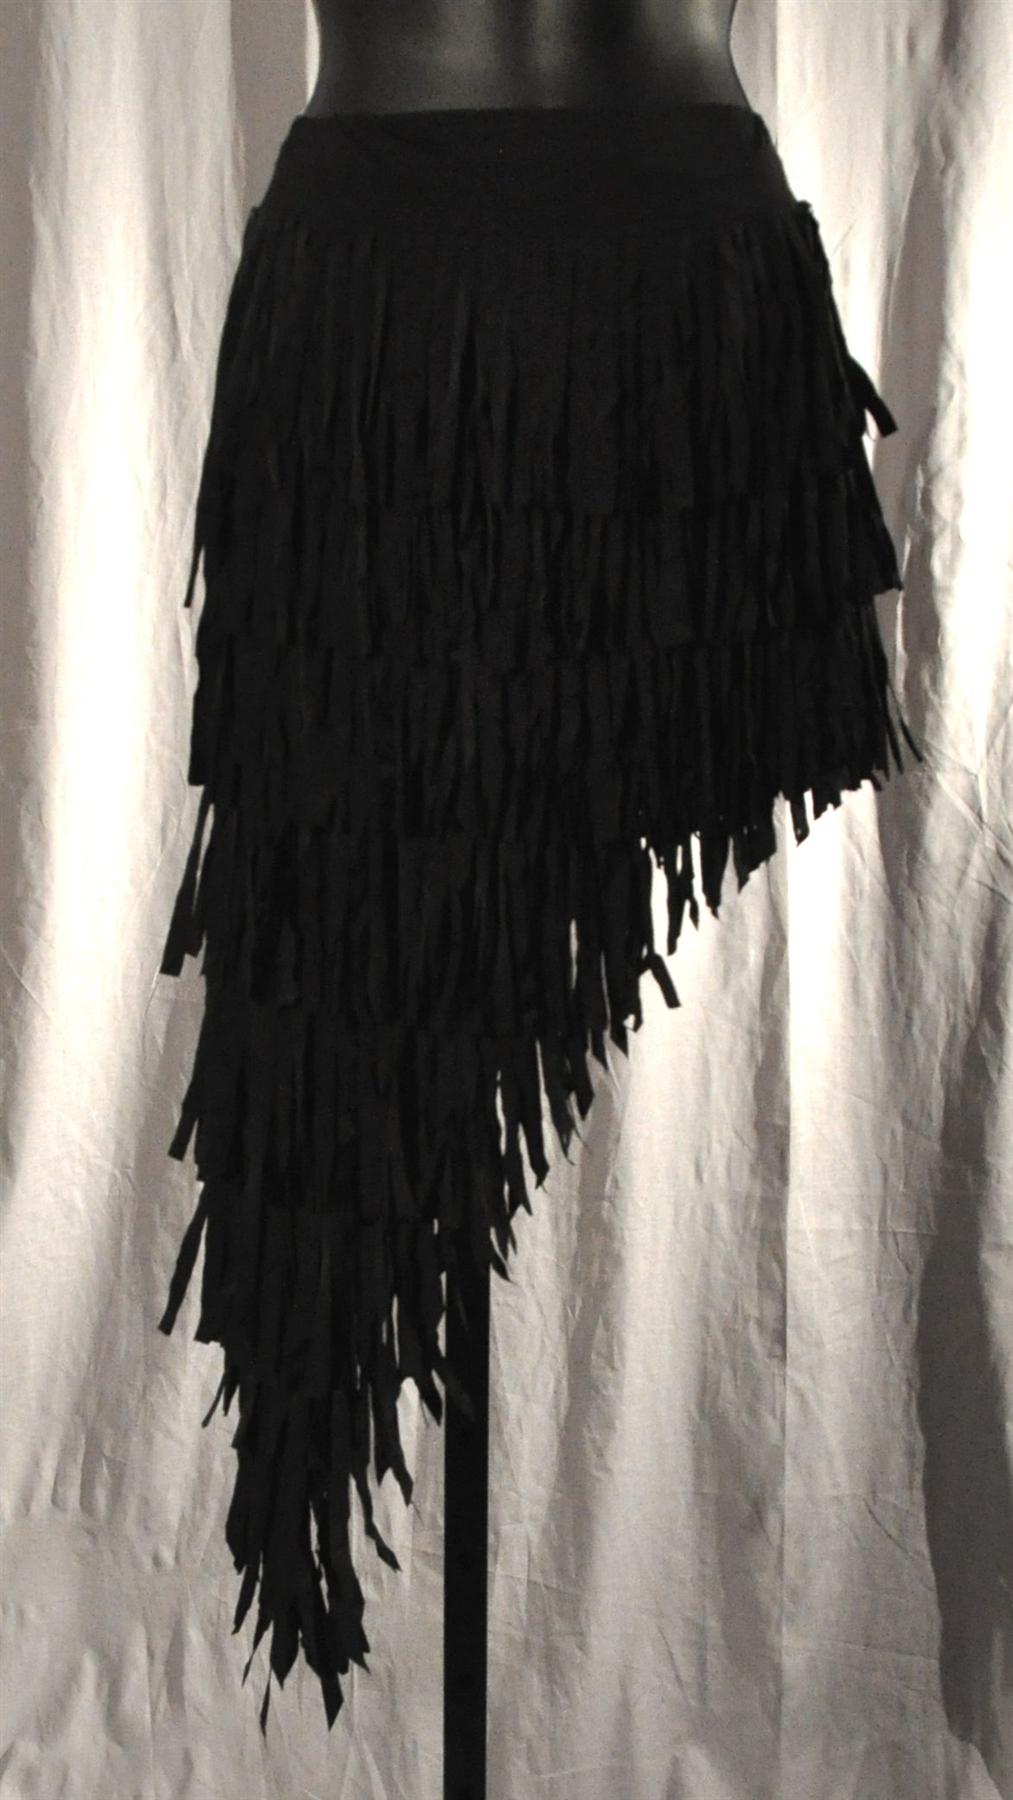 Slatend Cloth Fringe Short Skirt With Built In Under Pants